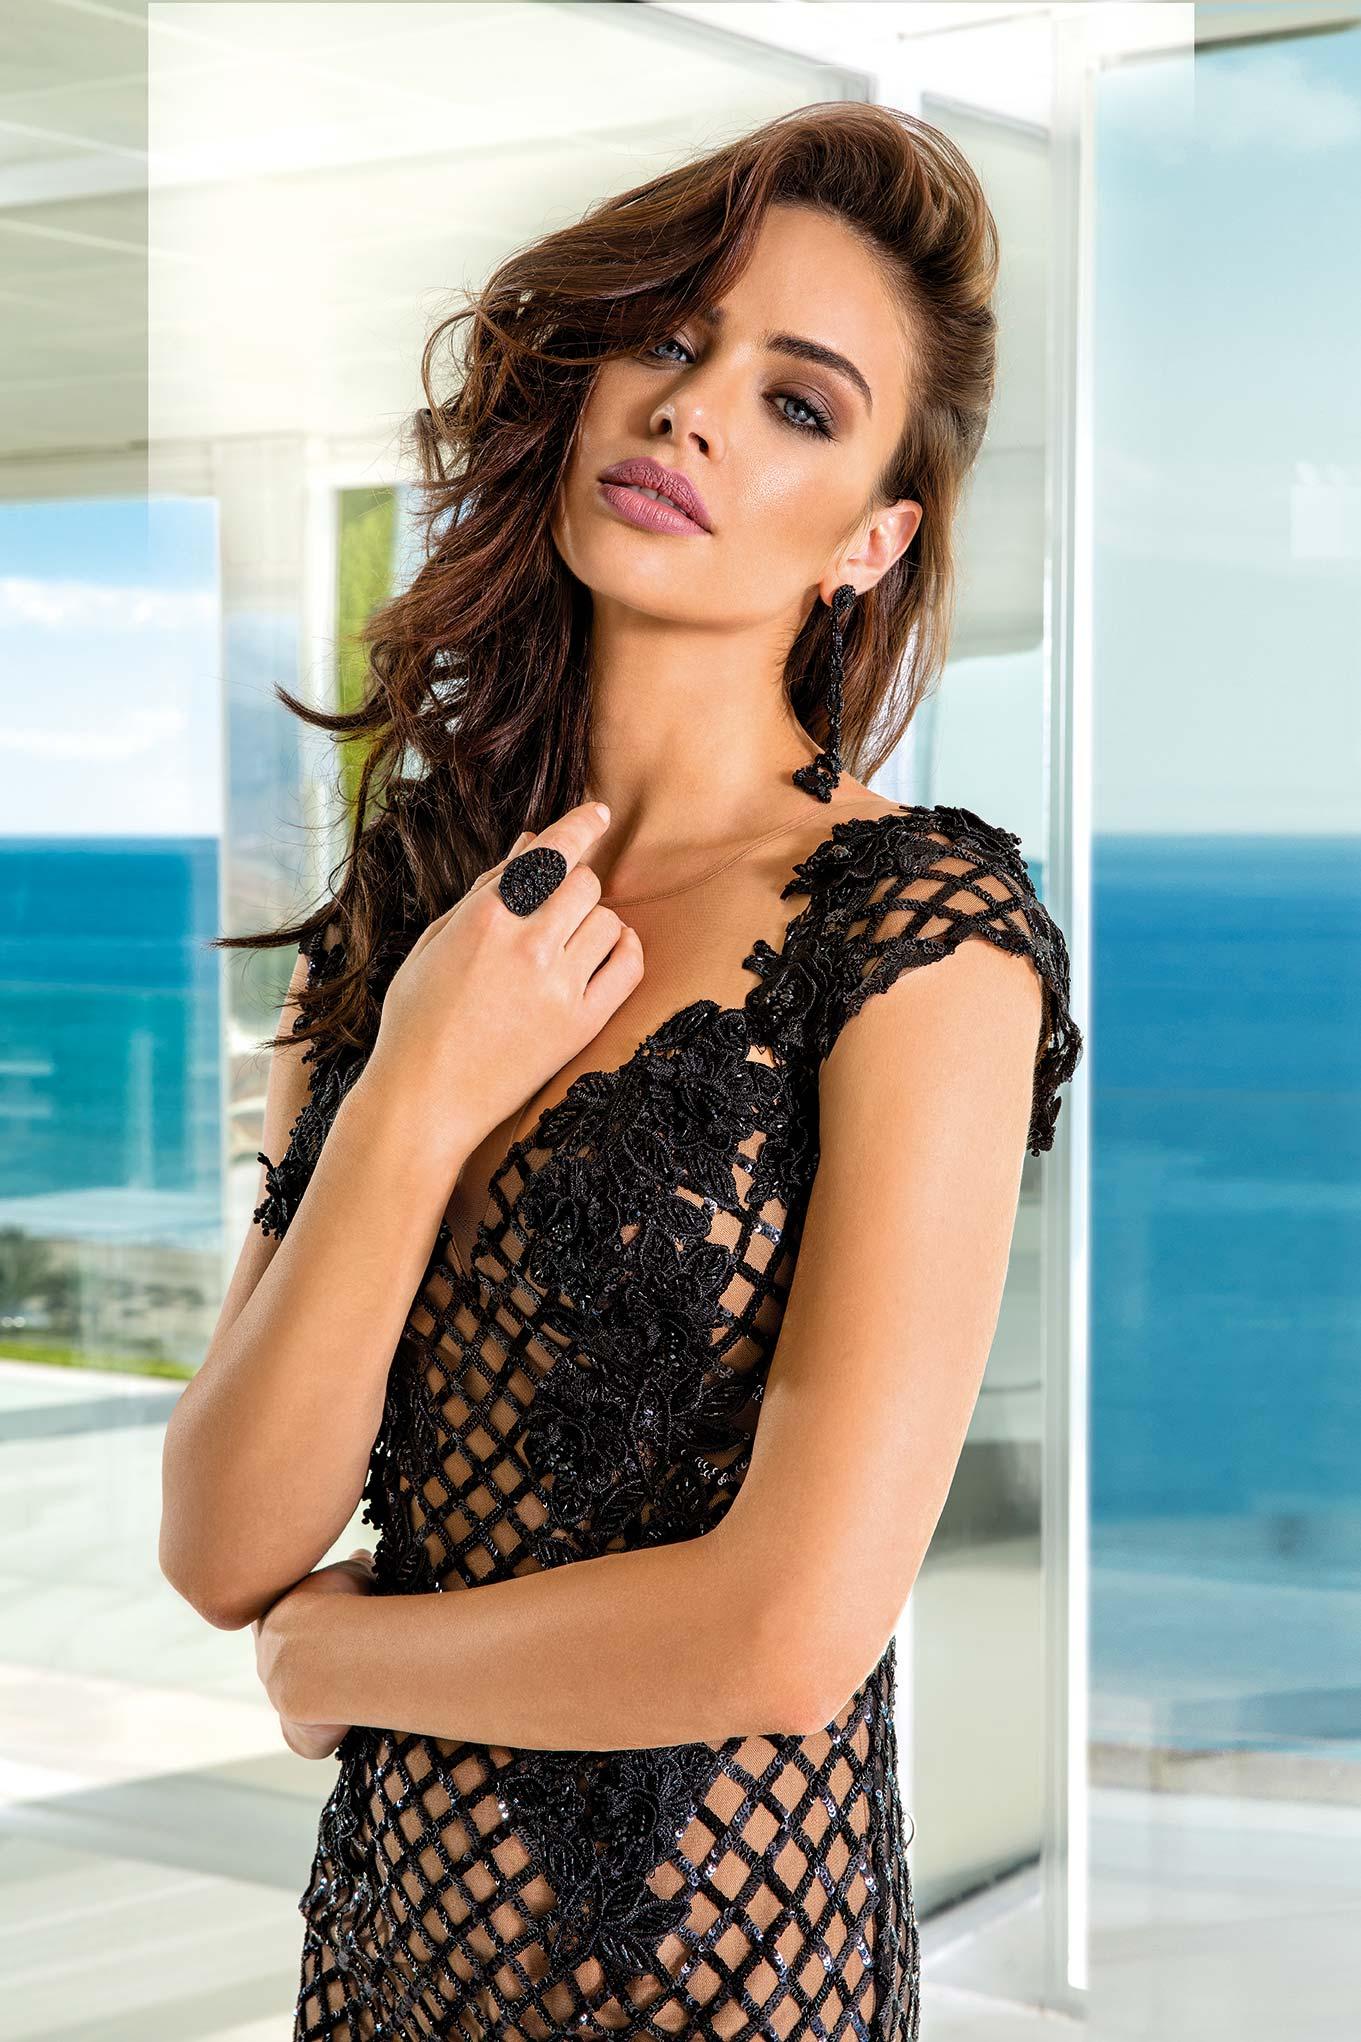 more photos b8898 07103 Nicole Meyer - Page 88 - Female Fashion Models - Bellazon